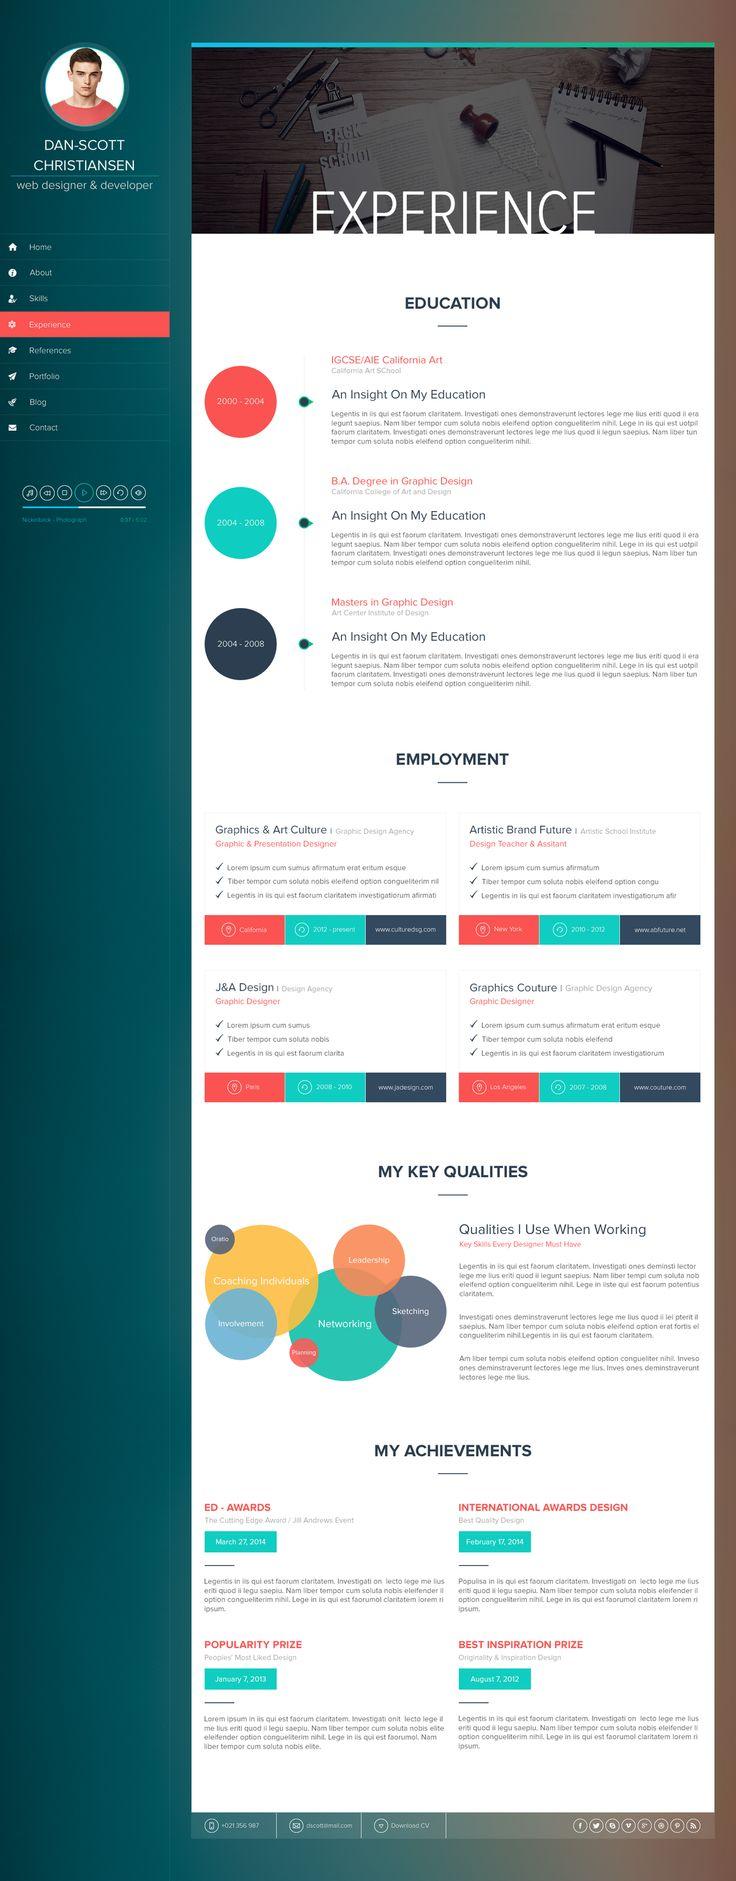 32 mejores imágenes de Design Resources en Pinterest | Diseño de ...